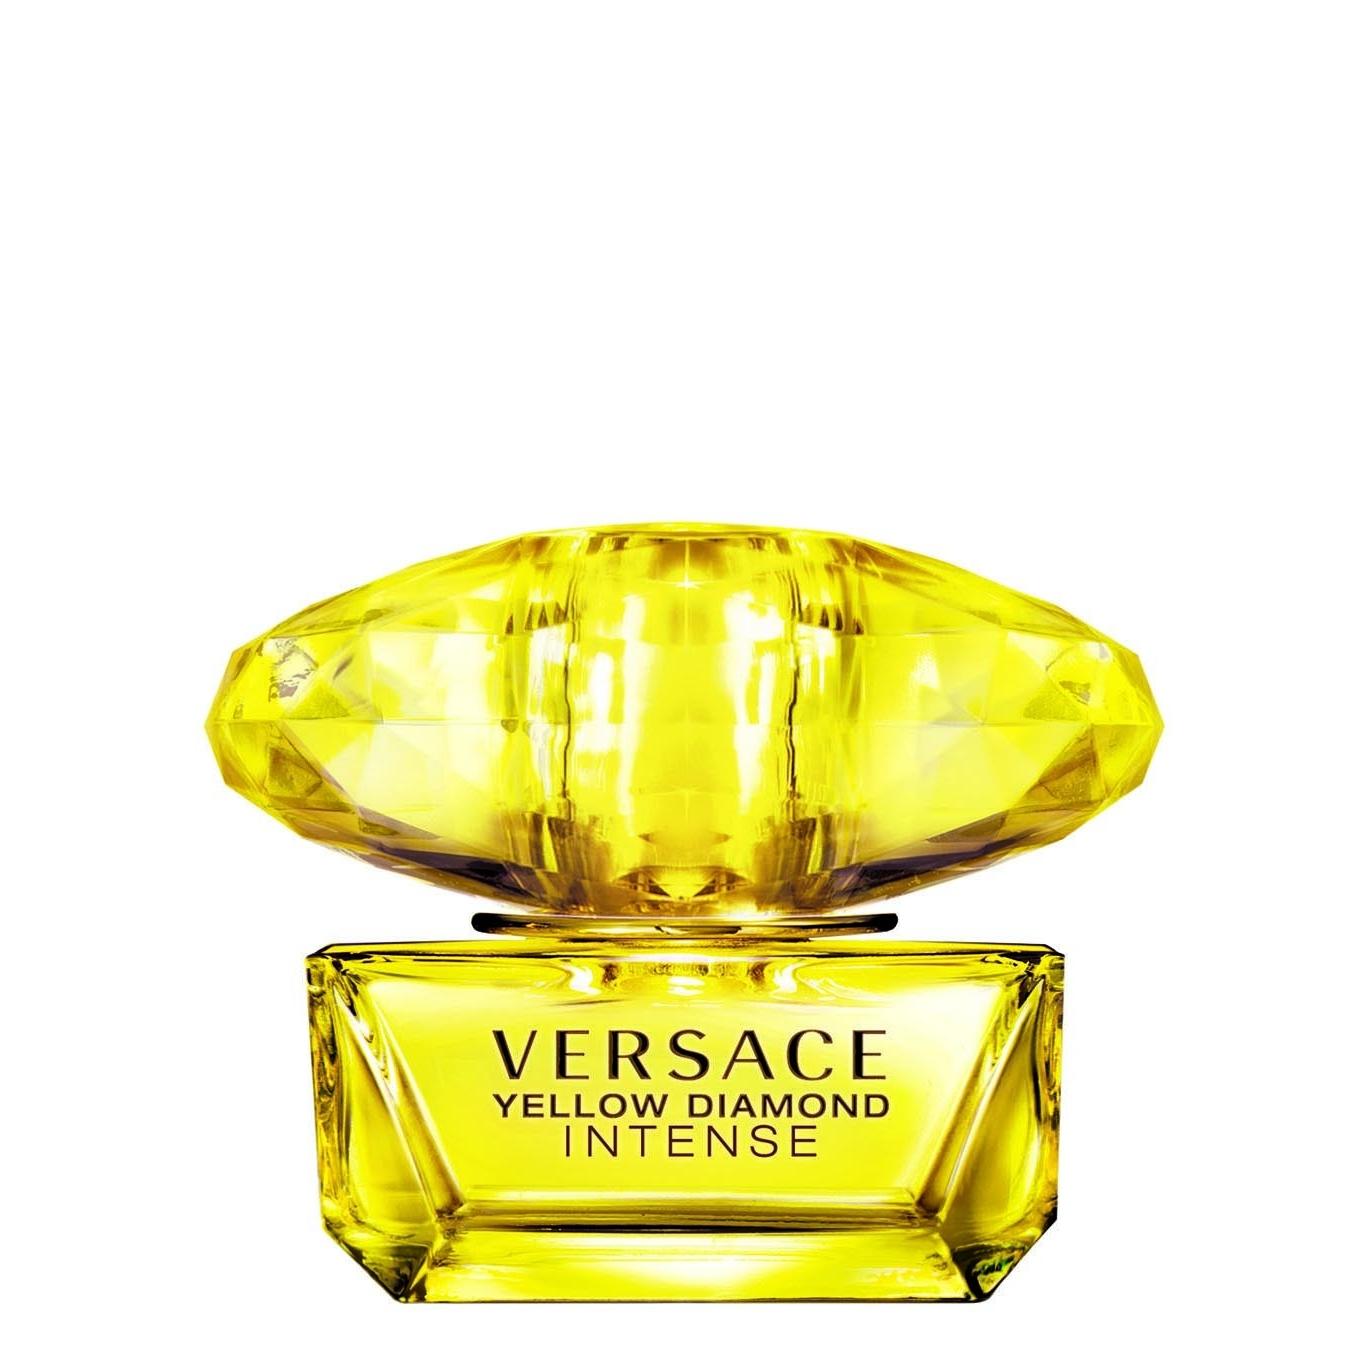 Versace Yellow Diamond Intense eau de parfum spray donna 30 ml